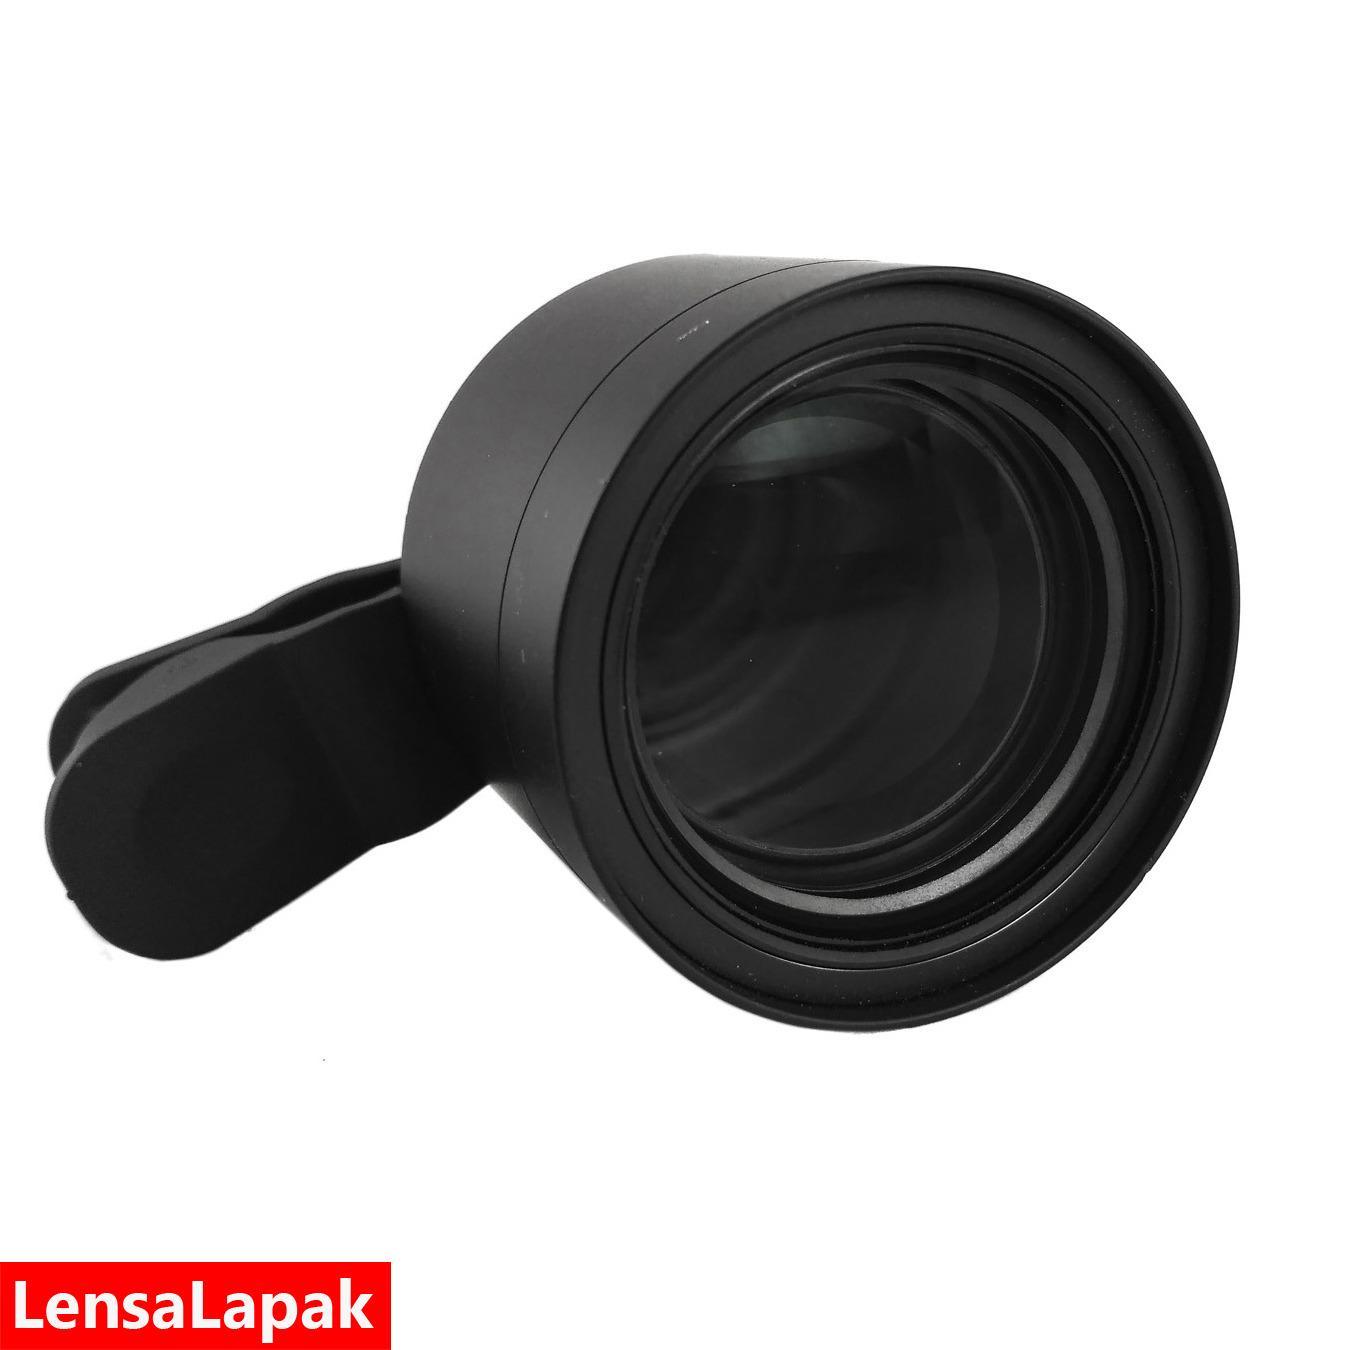 Diskon Minolta 45Mm Lensa Kamera Hp Macro Lensbong Prosumer For Smartphone Or Handphone Jawa Timur